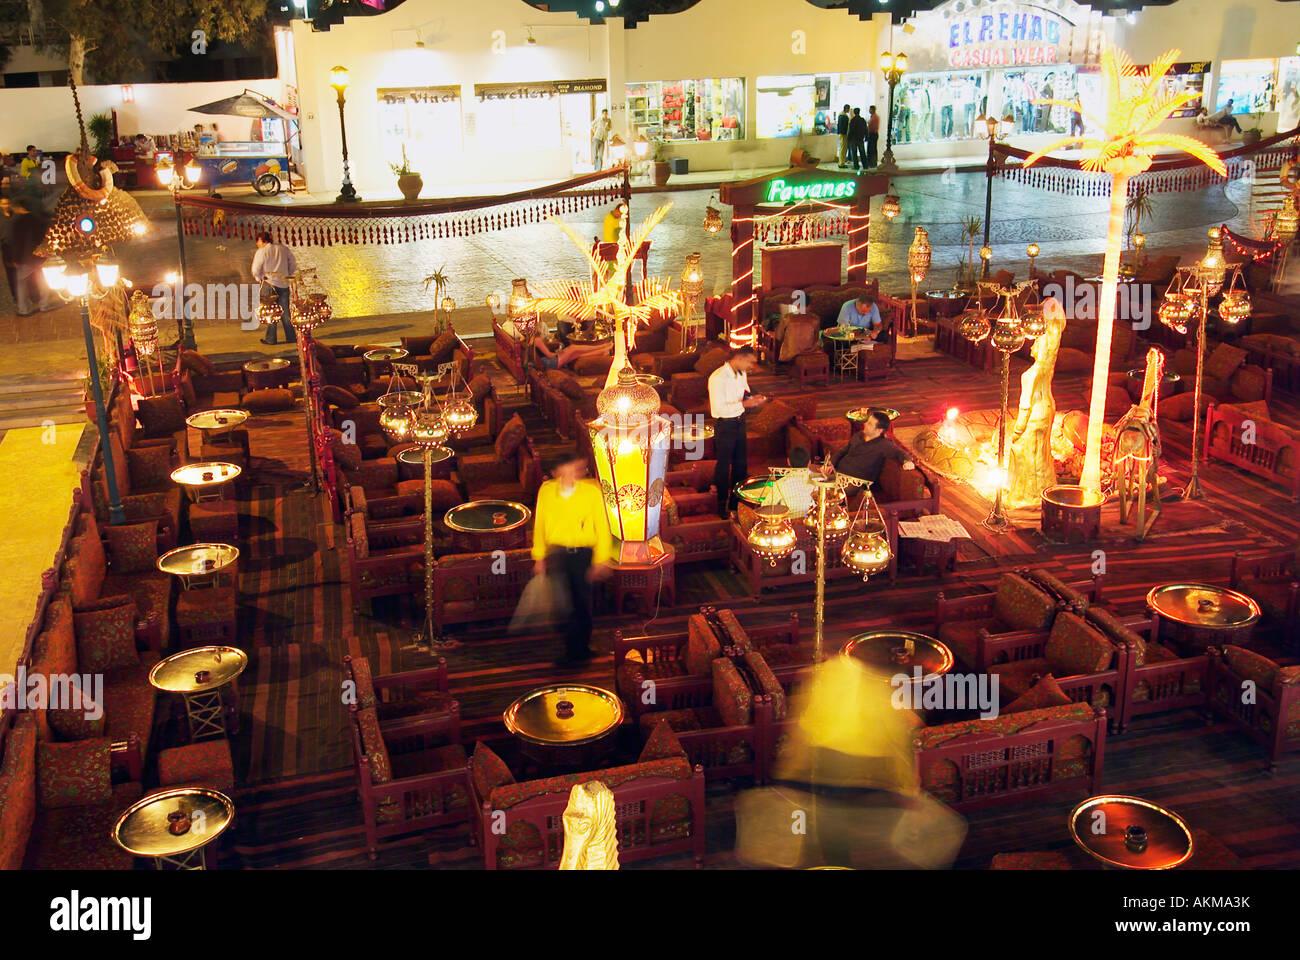 egypt sinai peninsula sharm el sheikh fewanes shisha cafe. Black Bedroom Furniture Sets. Home Design Ideas